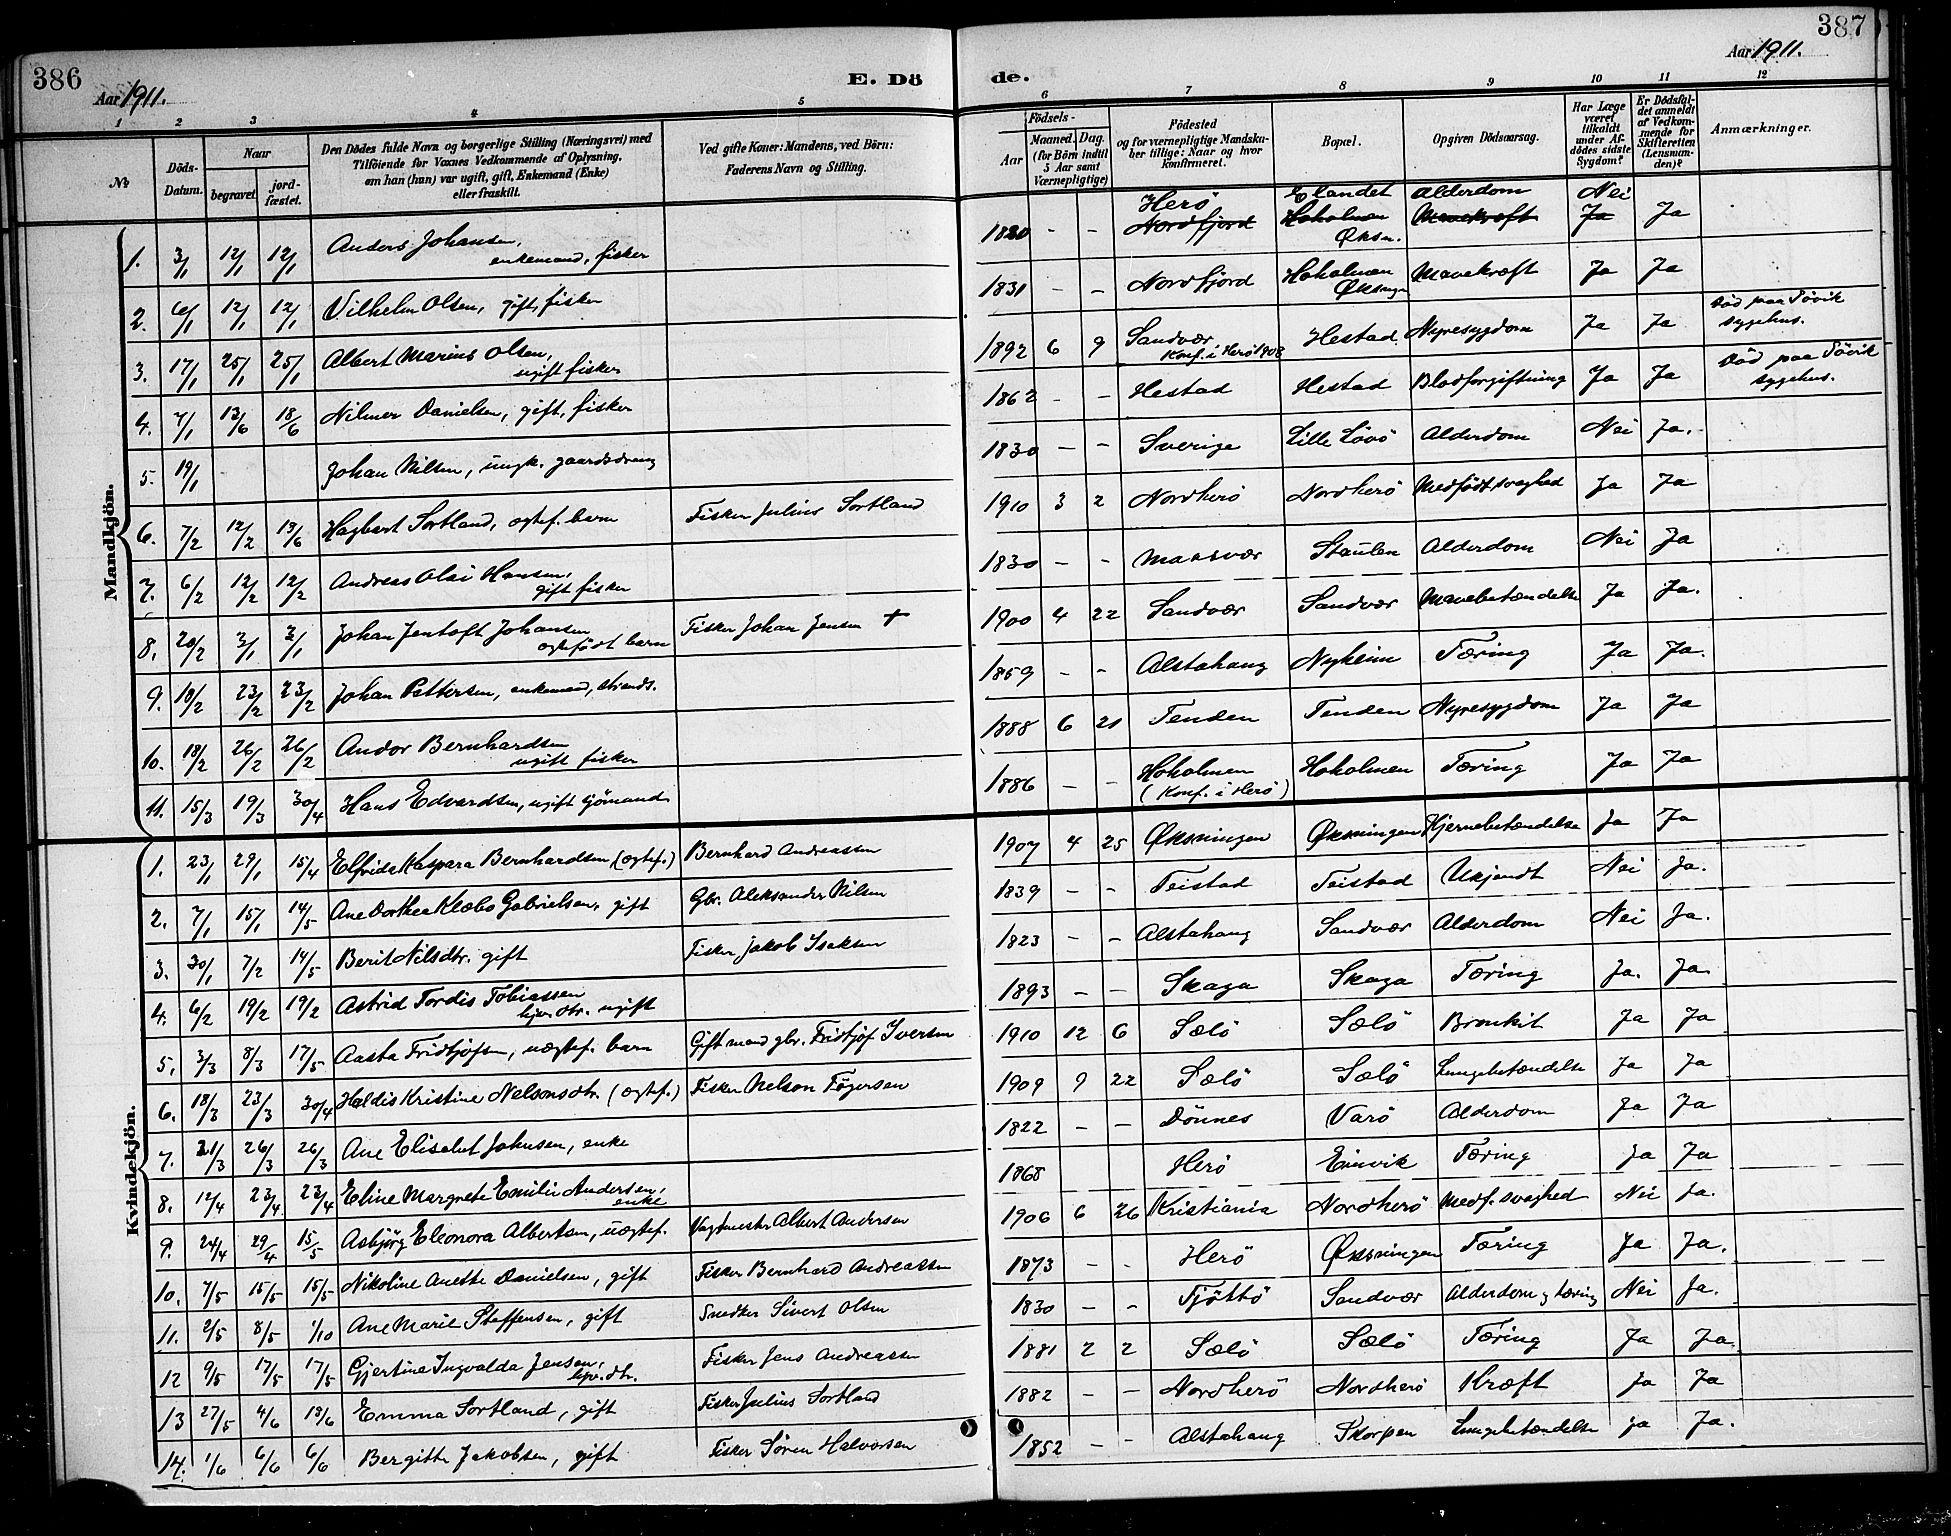 SAT, Ministerialprotokoller, klokkerbøker og fødselsregistre - Nordland, 834/L0516: Klokkerbok nr. 834C06, 1902-1918, s. 386-387